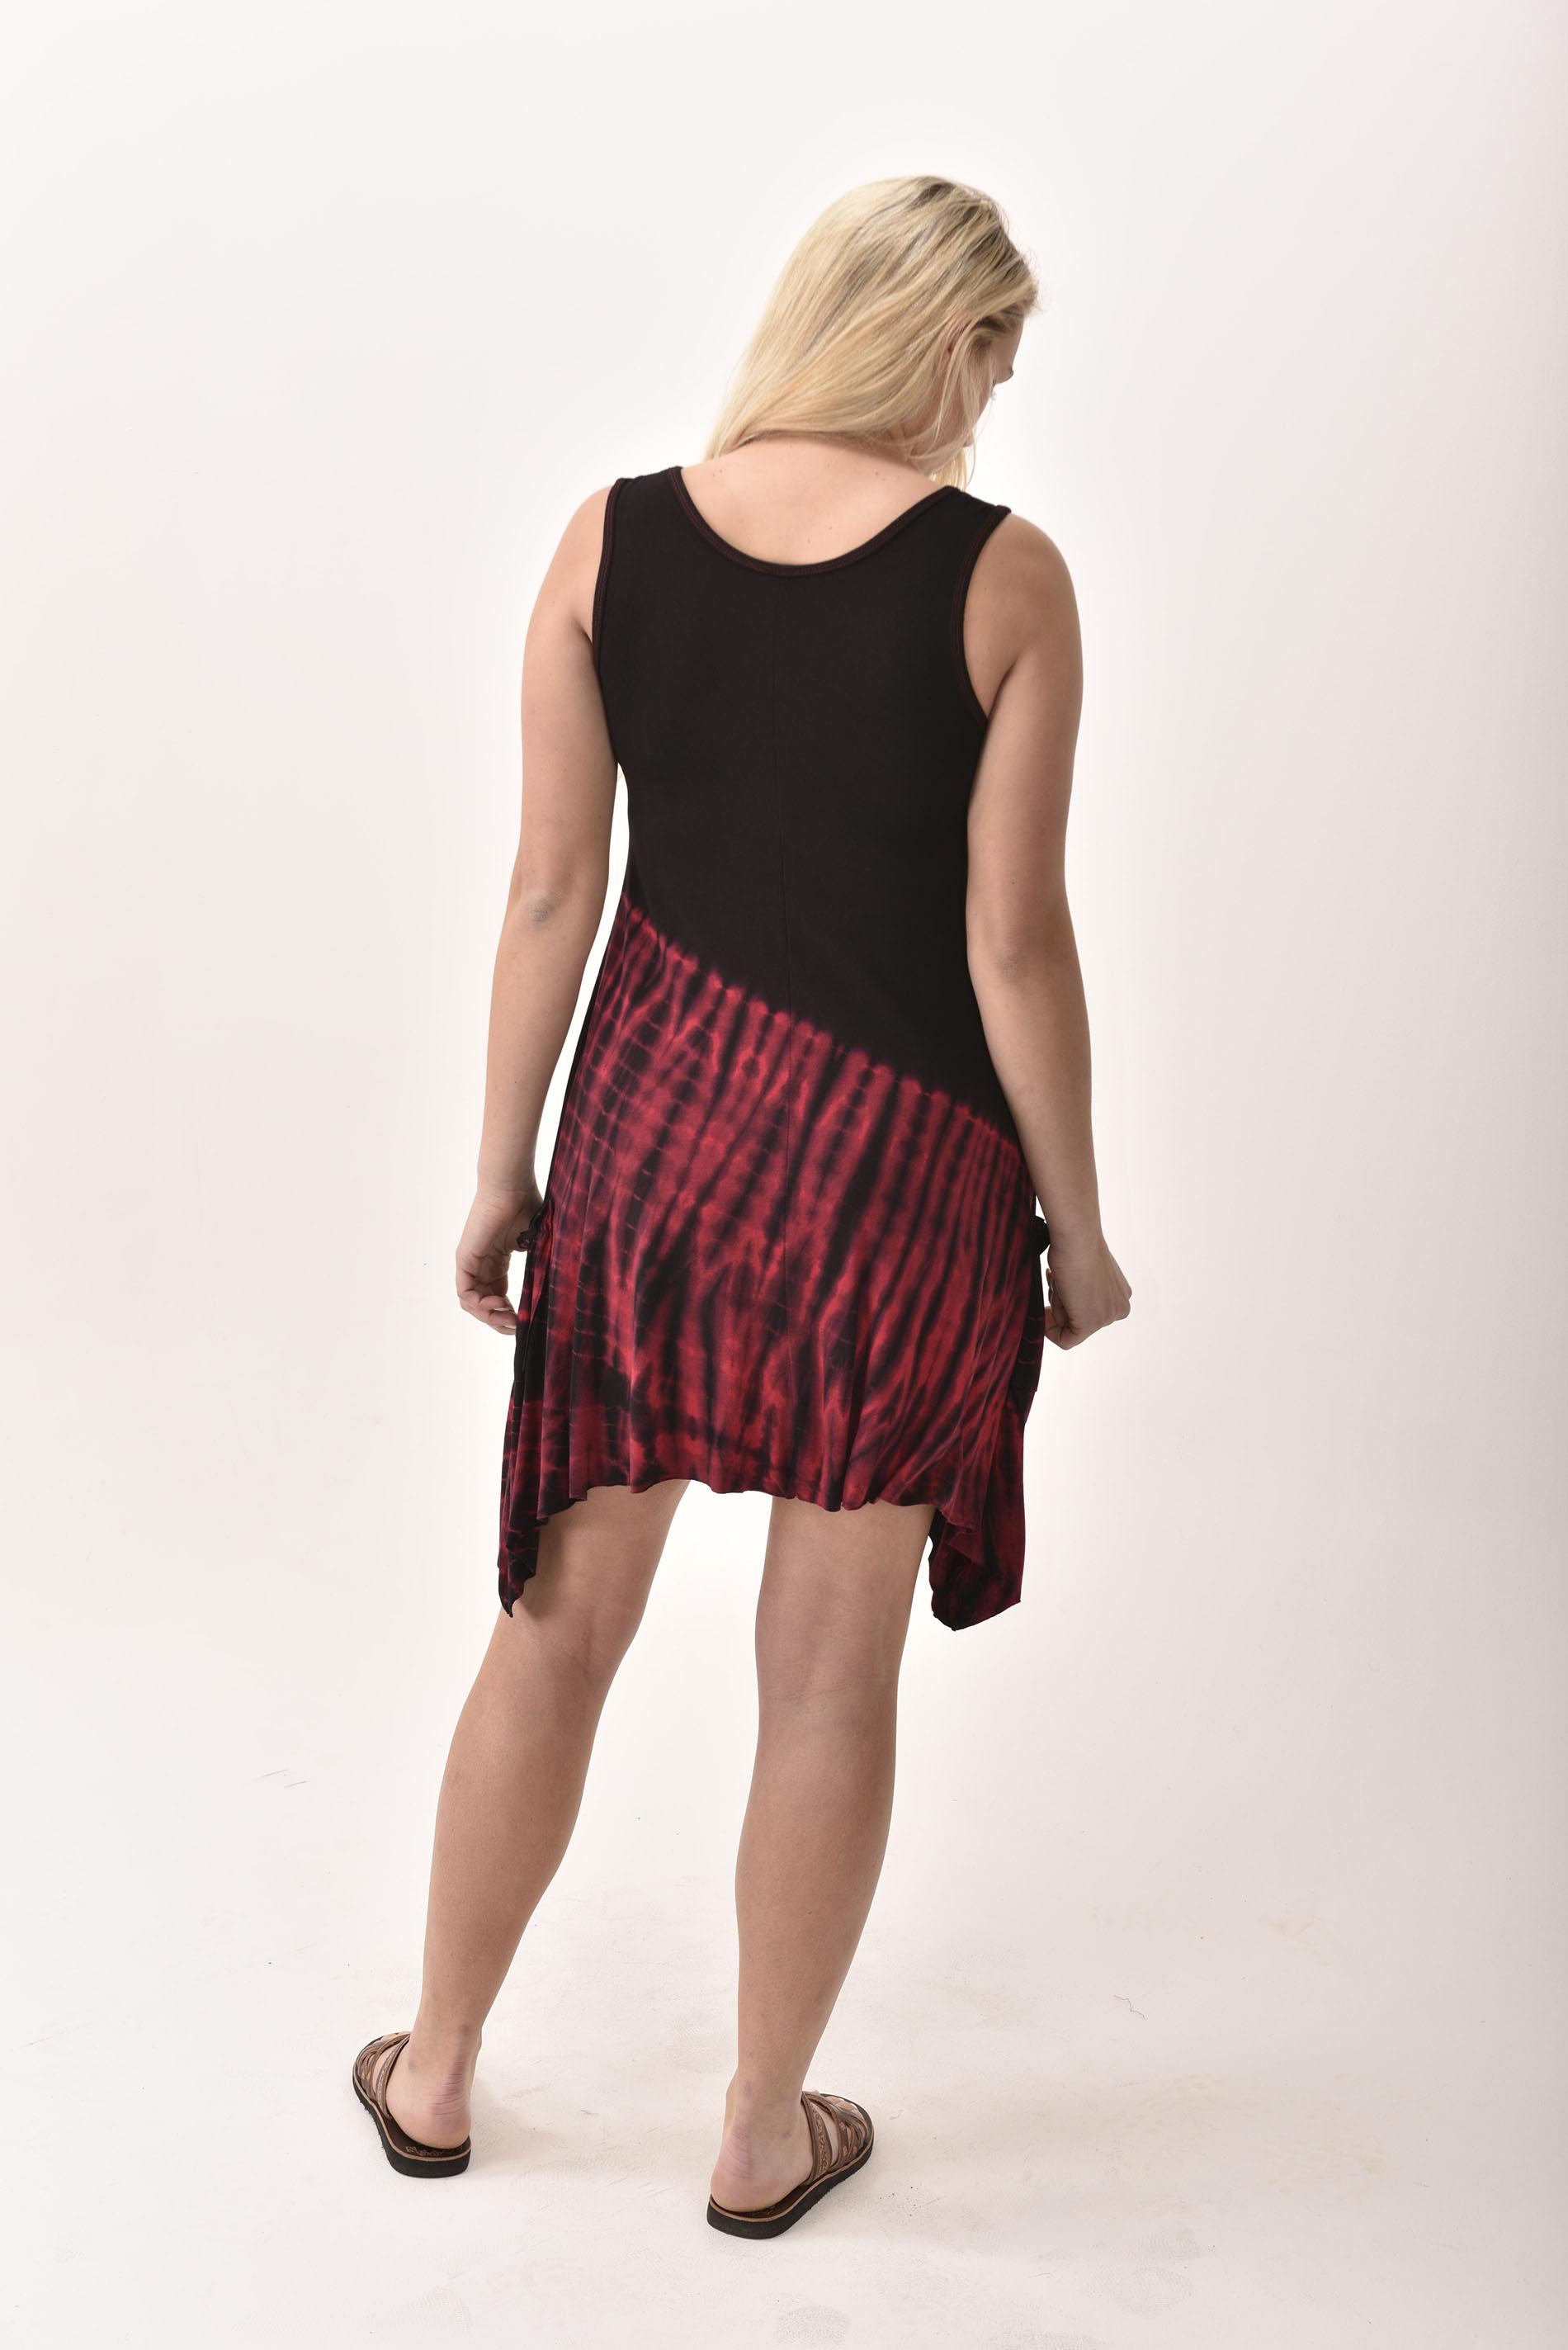 Pocket Sundress, Hand Painted Tie Dye, Black Red Multi